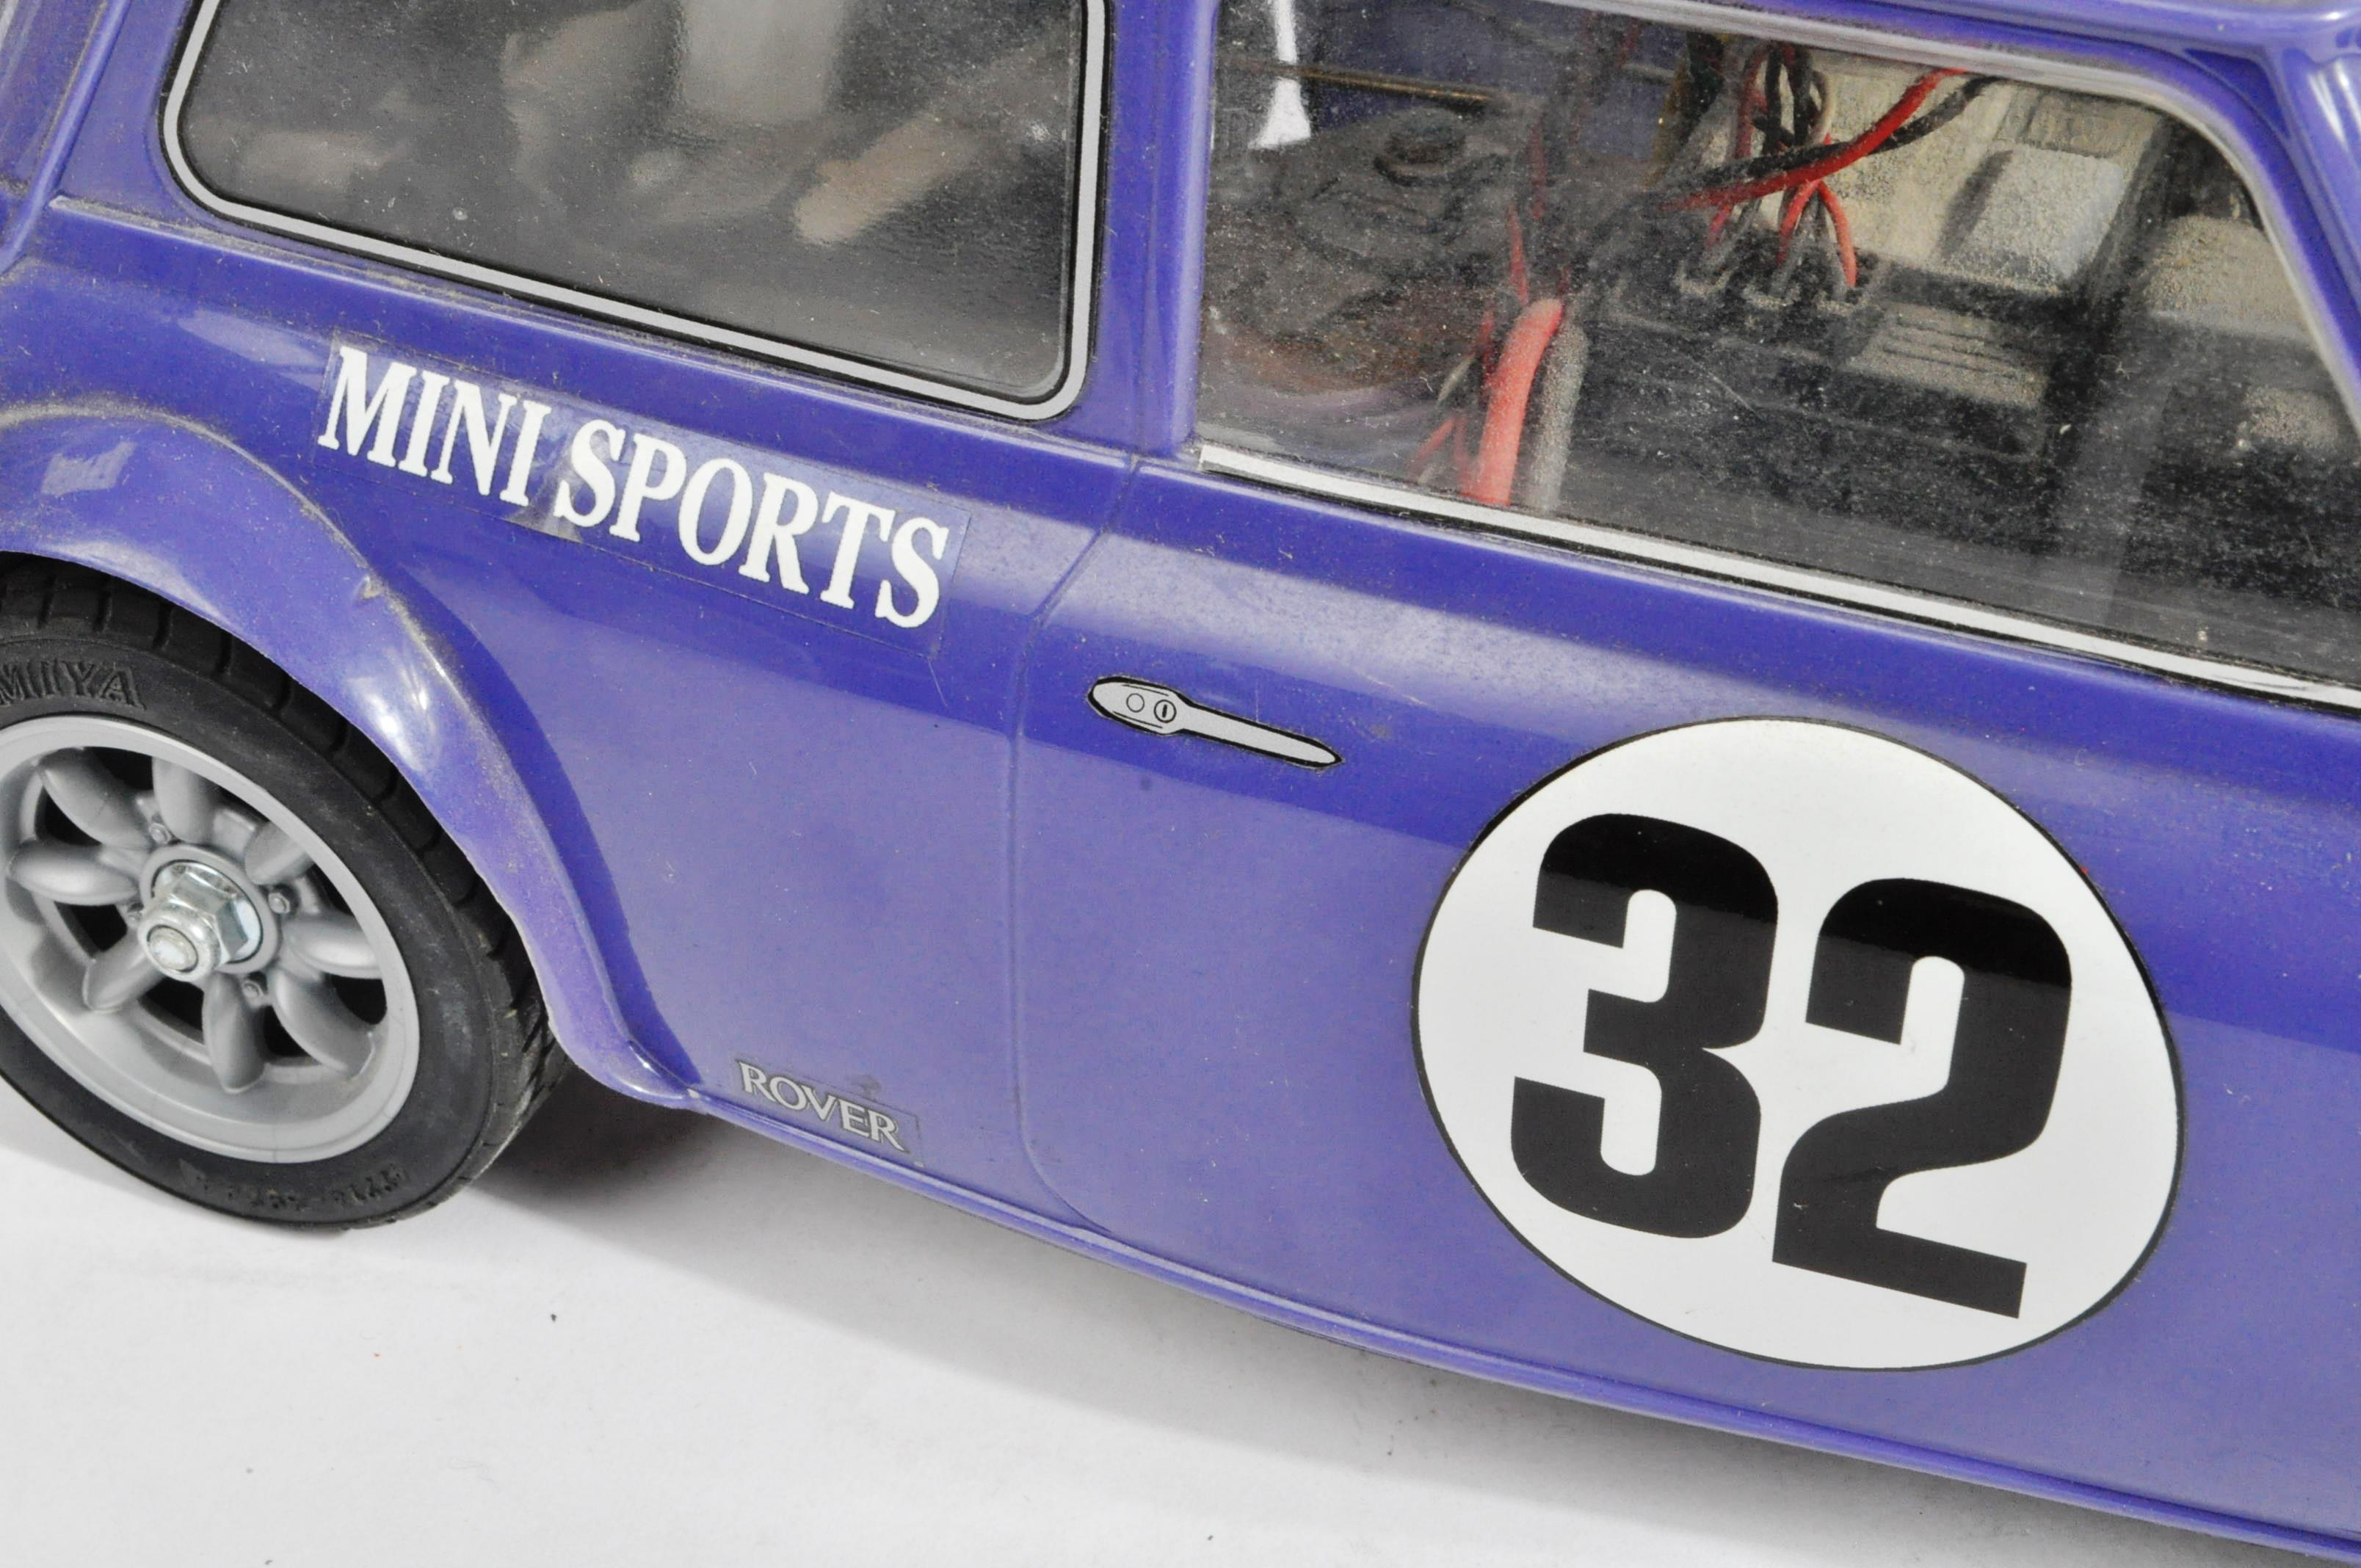 TAMIYA - TWO VINTAGE MINI COOPER RACING RC RADIO CONTROLLED CARS - Image 4 of 5